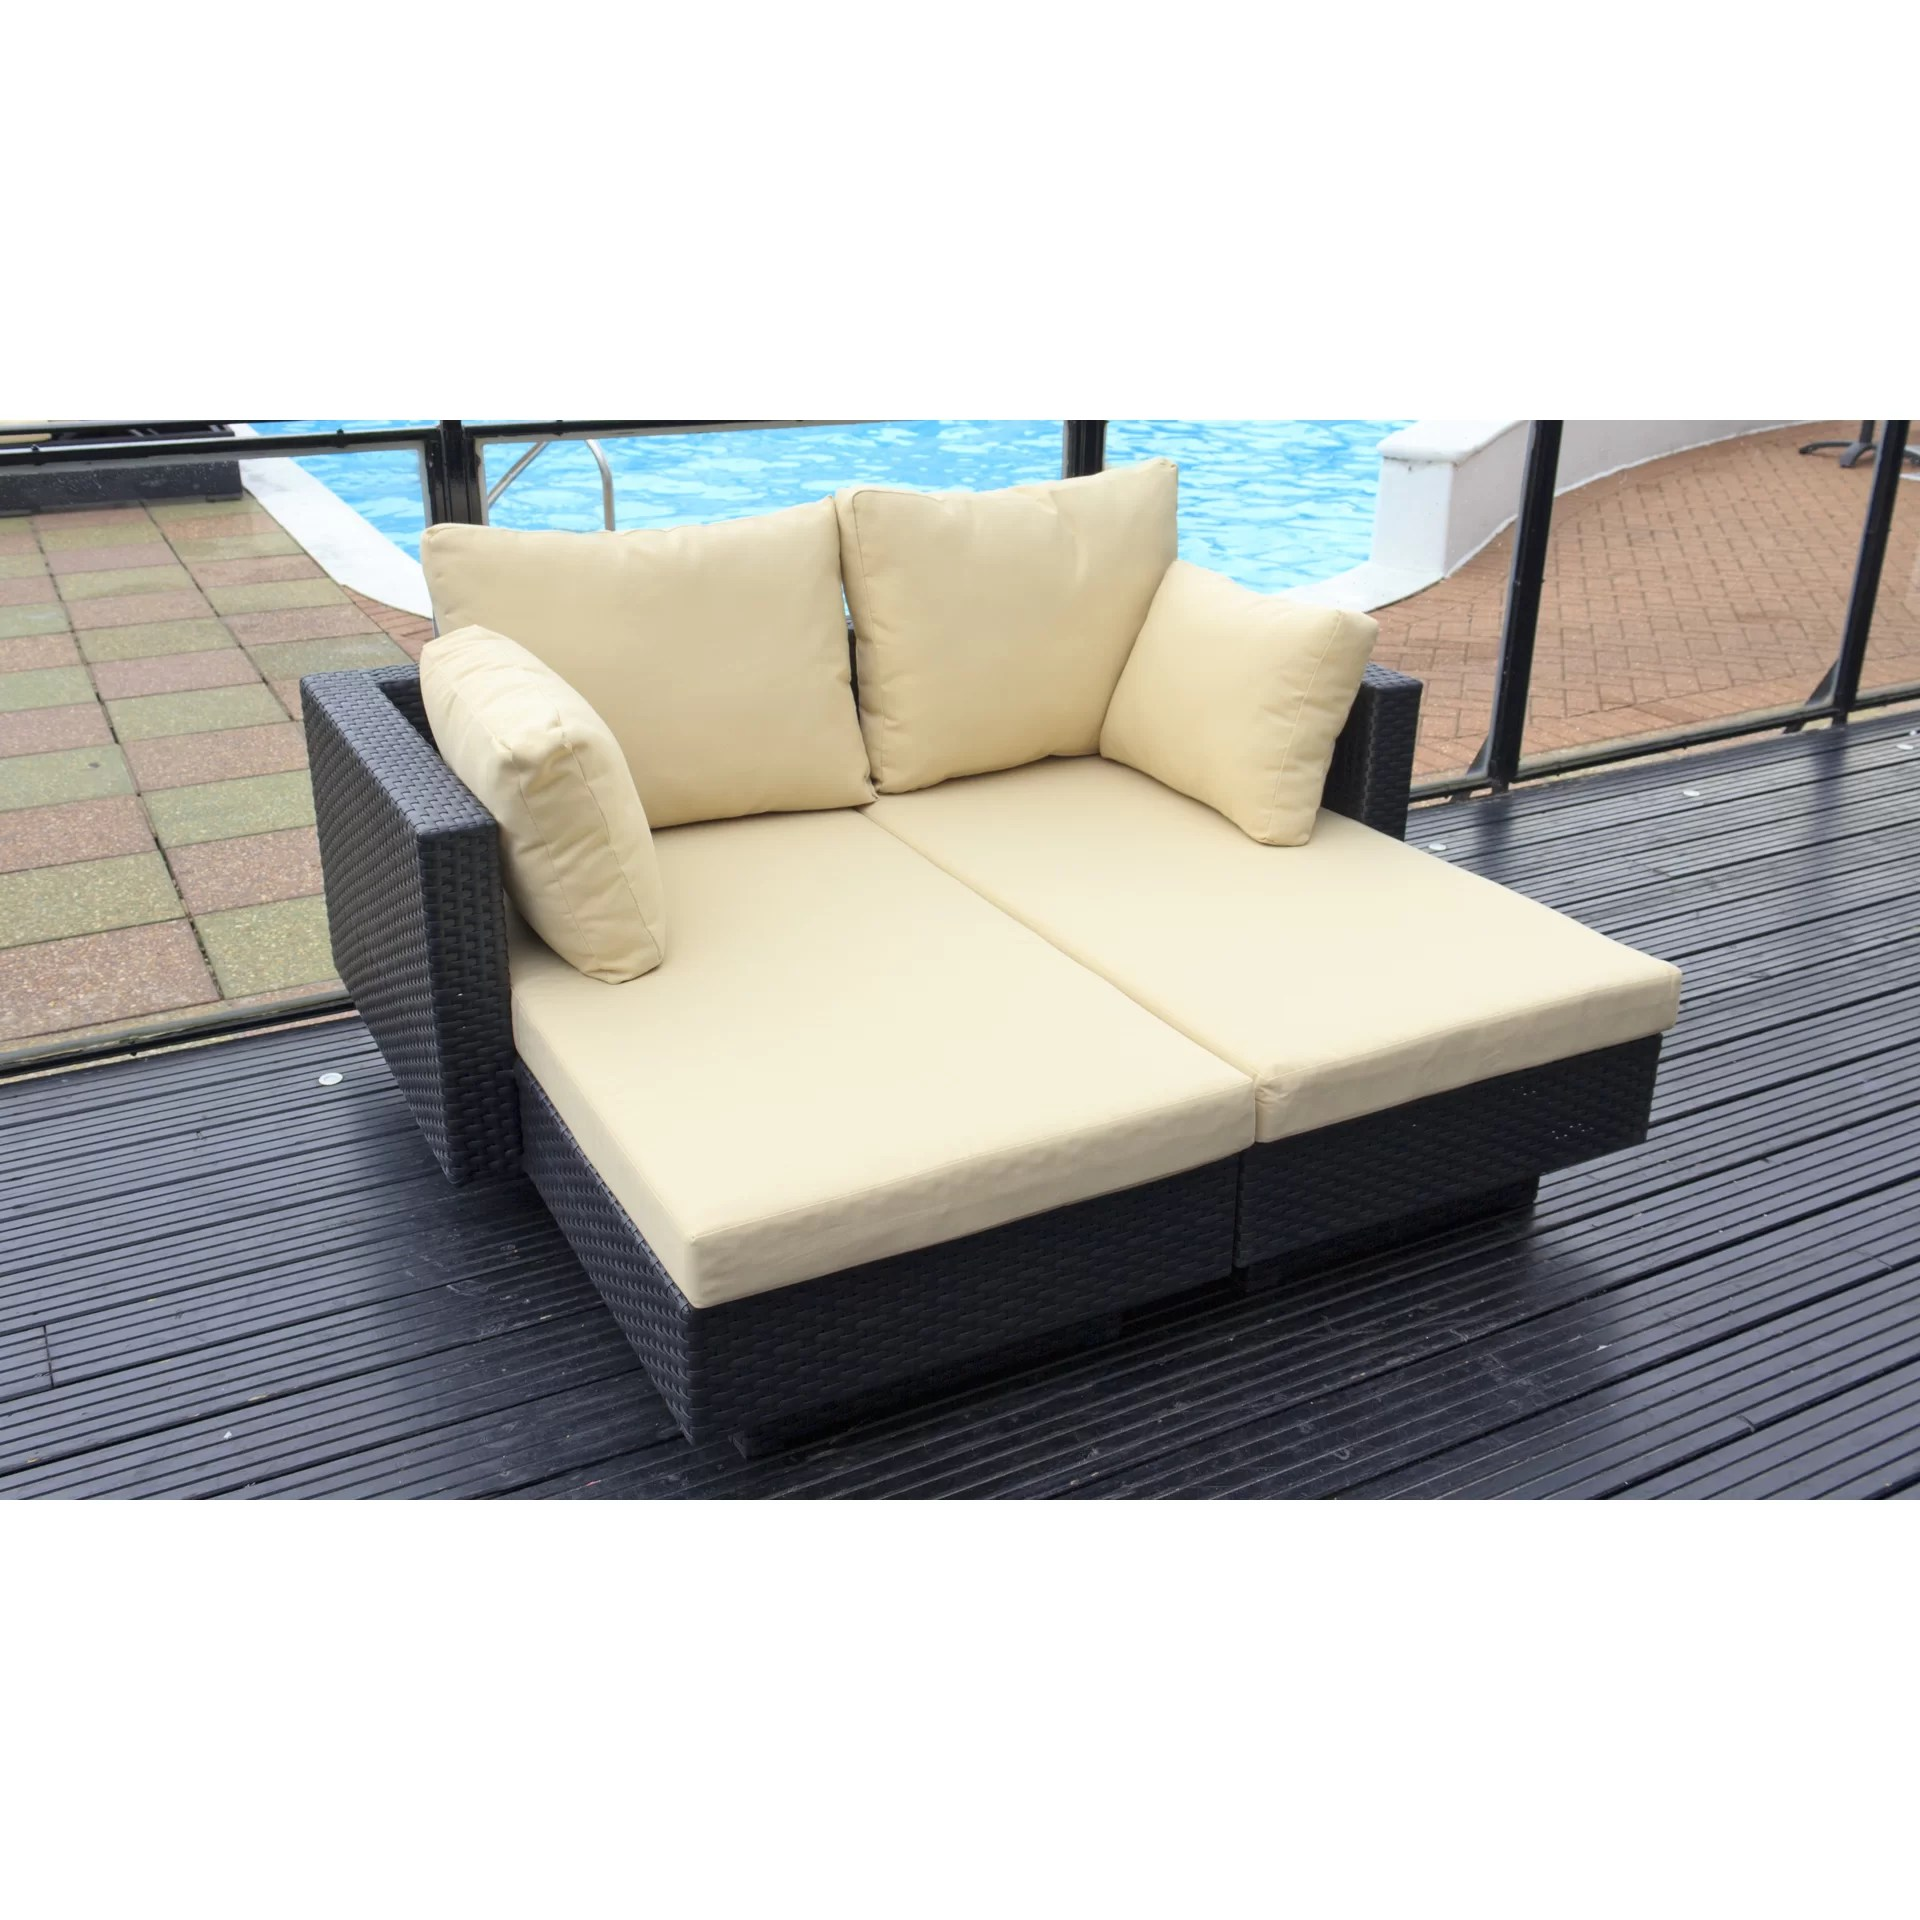 cushion sofa set cheap italian leather sofas uk cozy bay chicago 2 seater with cushions wayfair